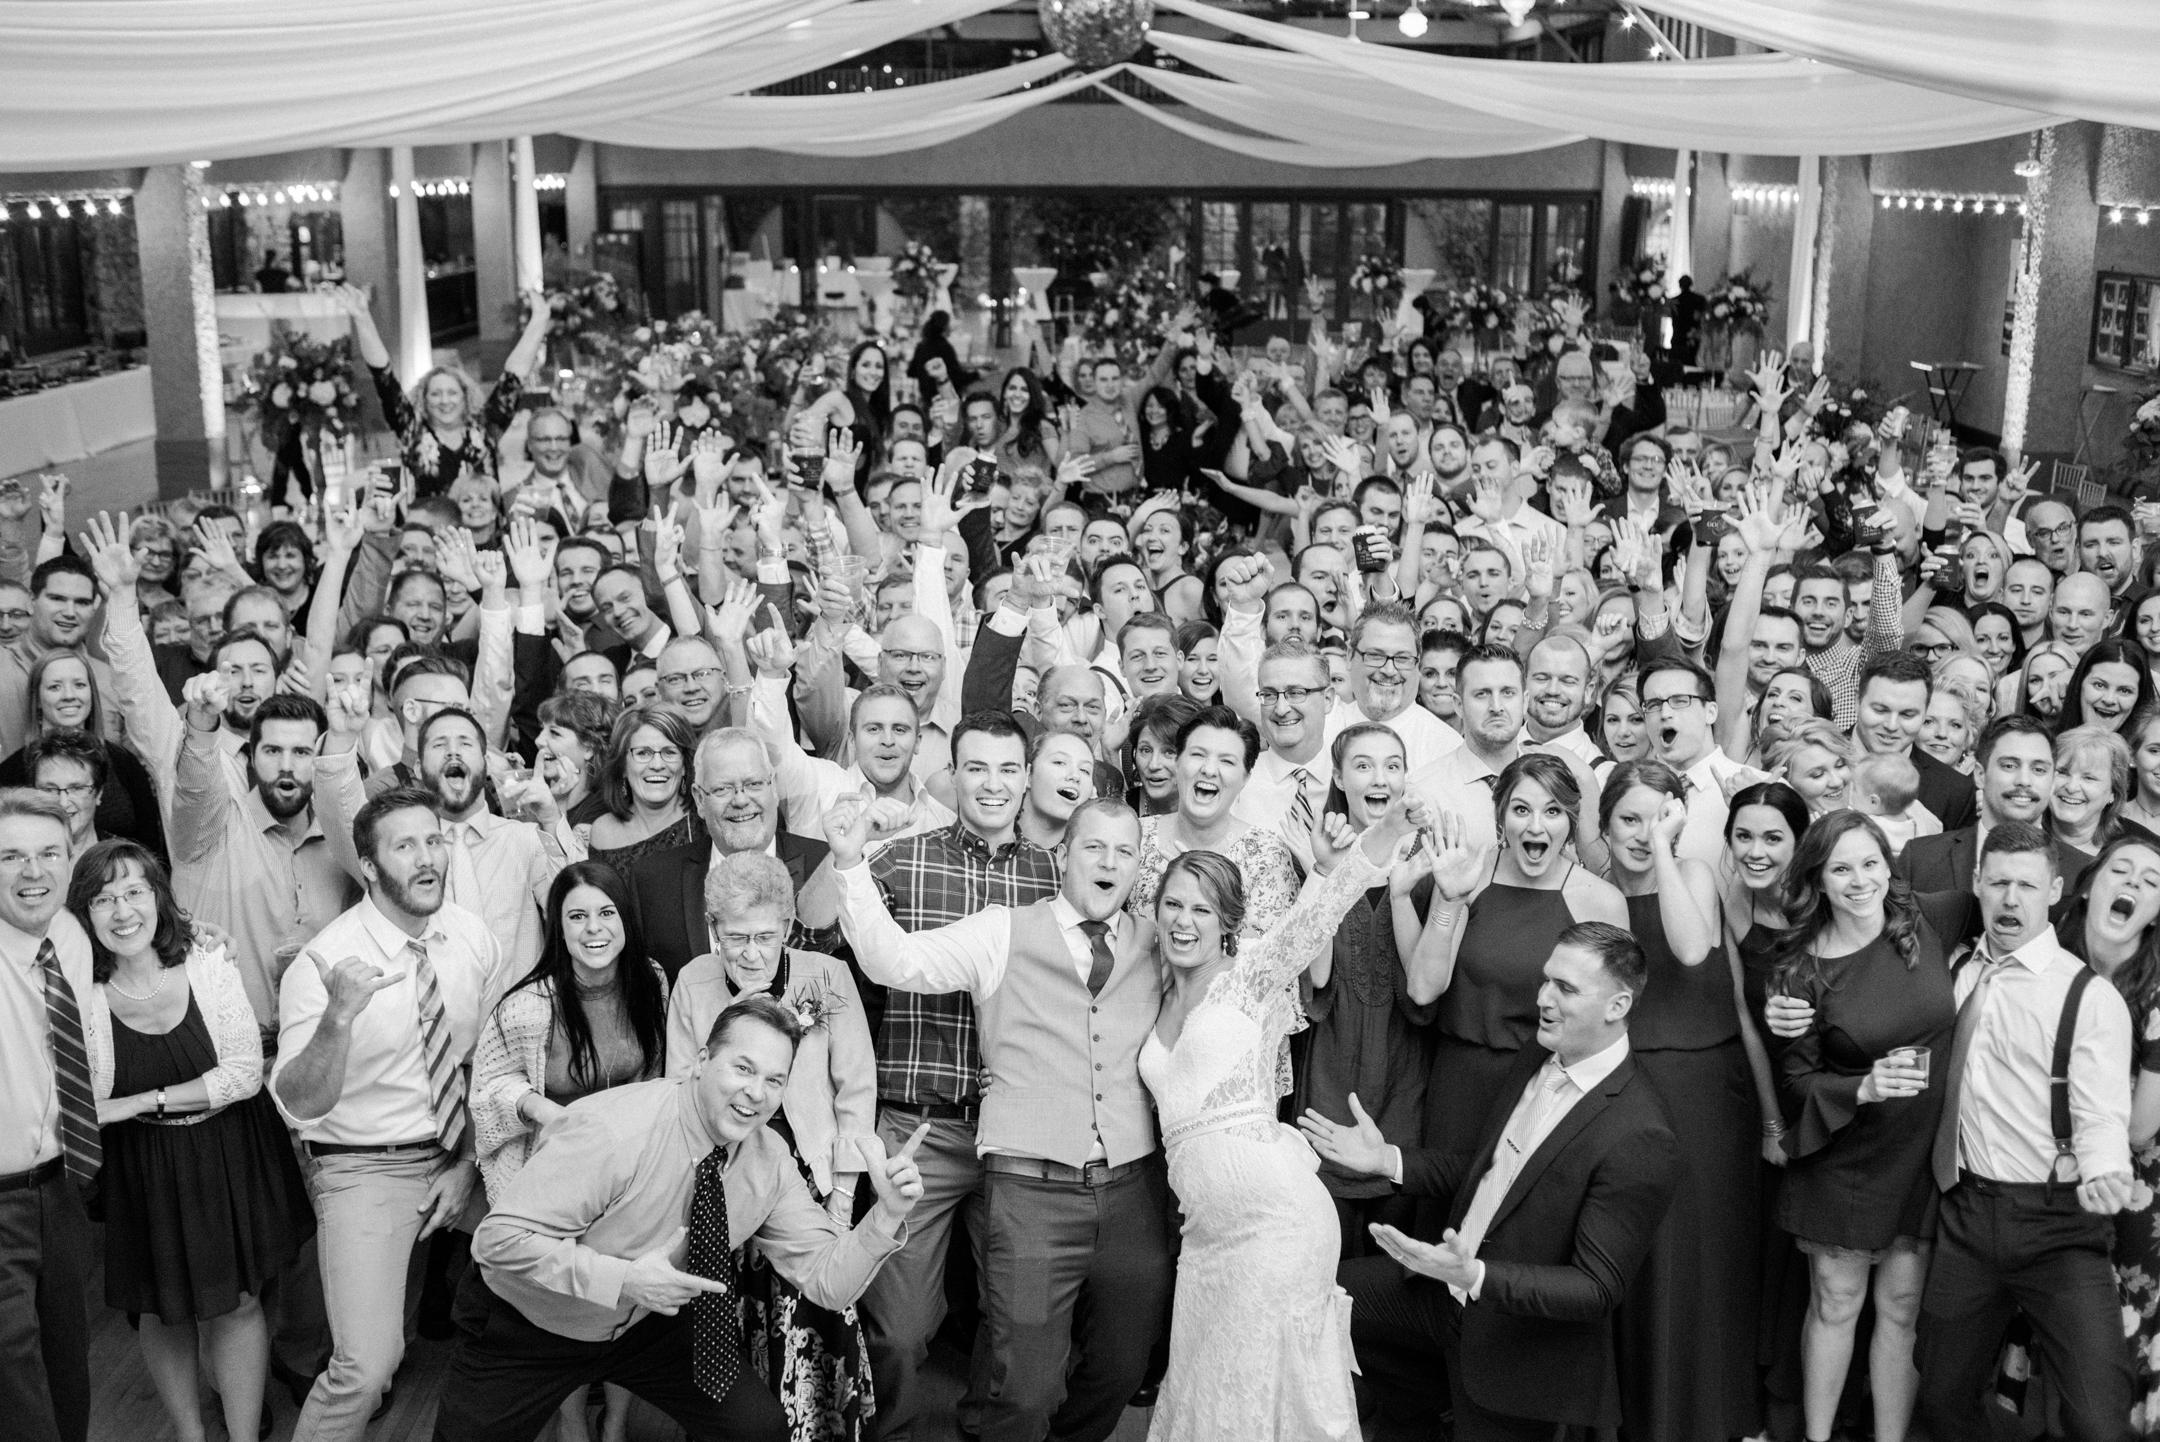 wedding reception at Rothschild Pavilion in WI